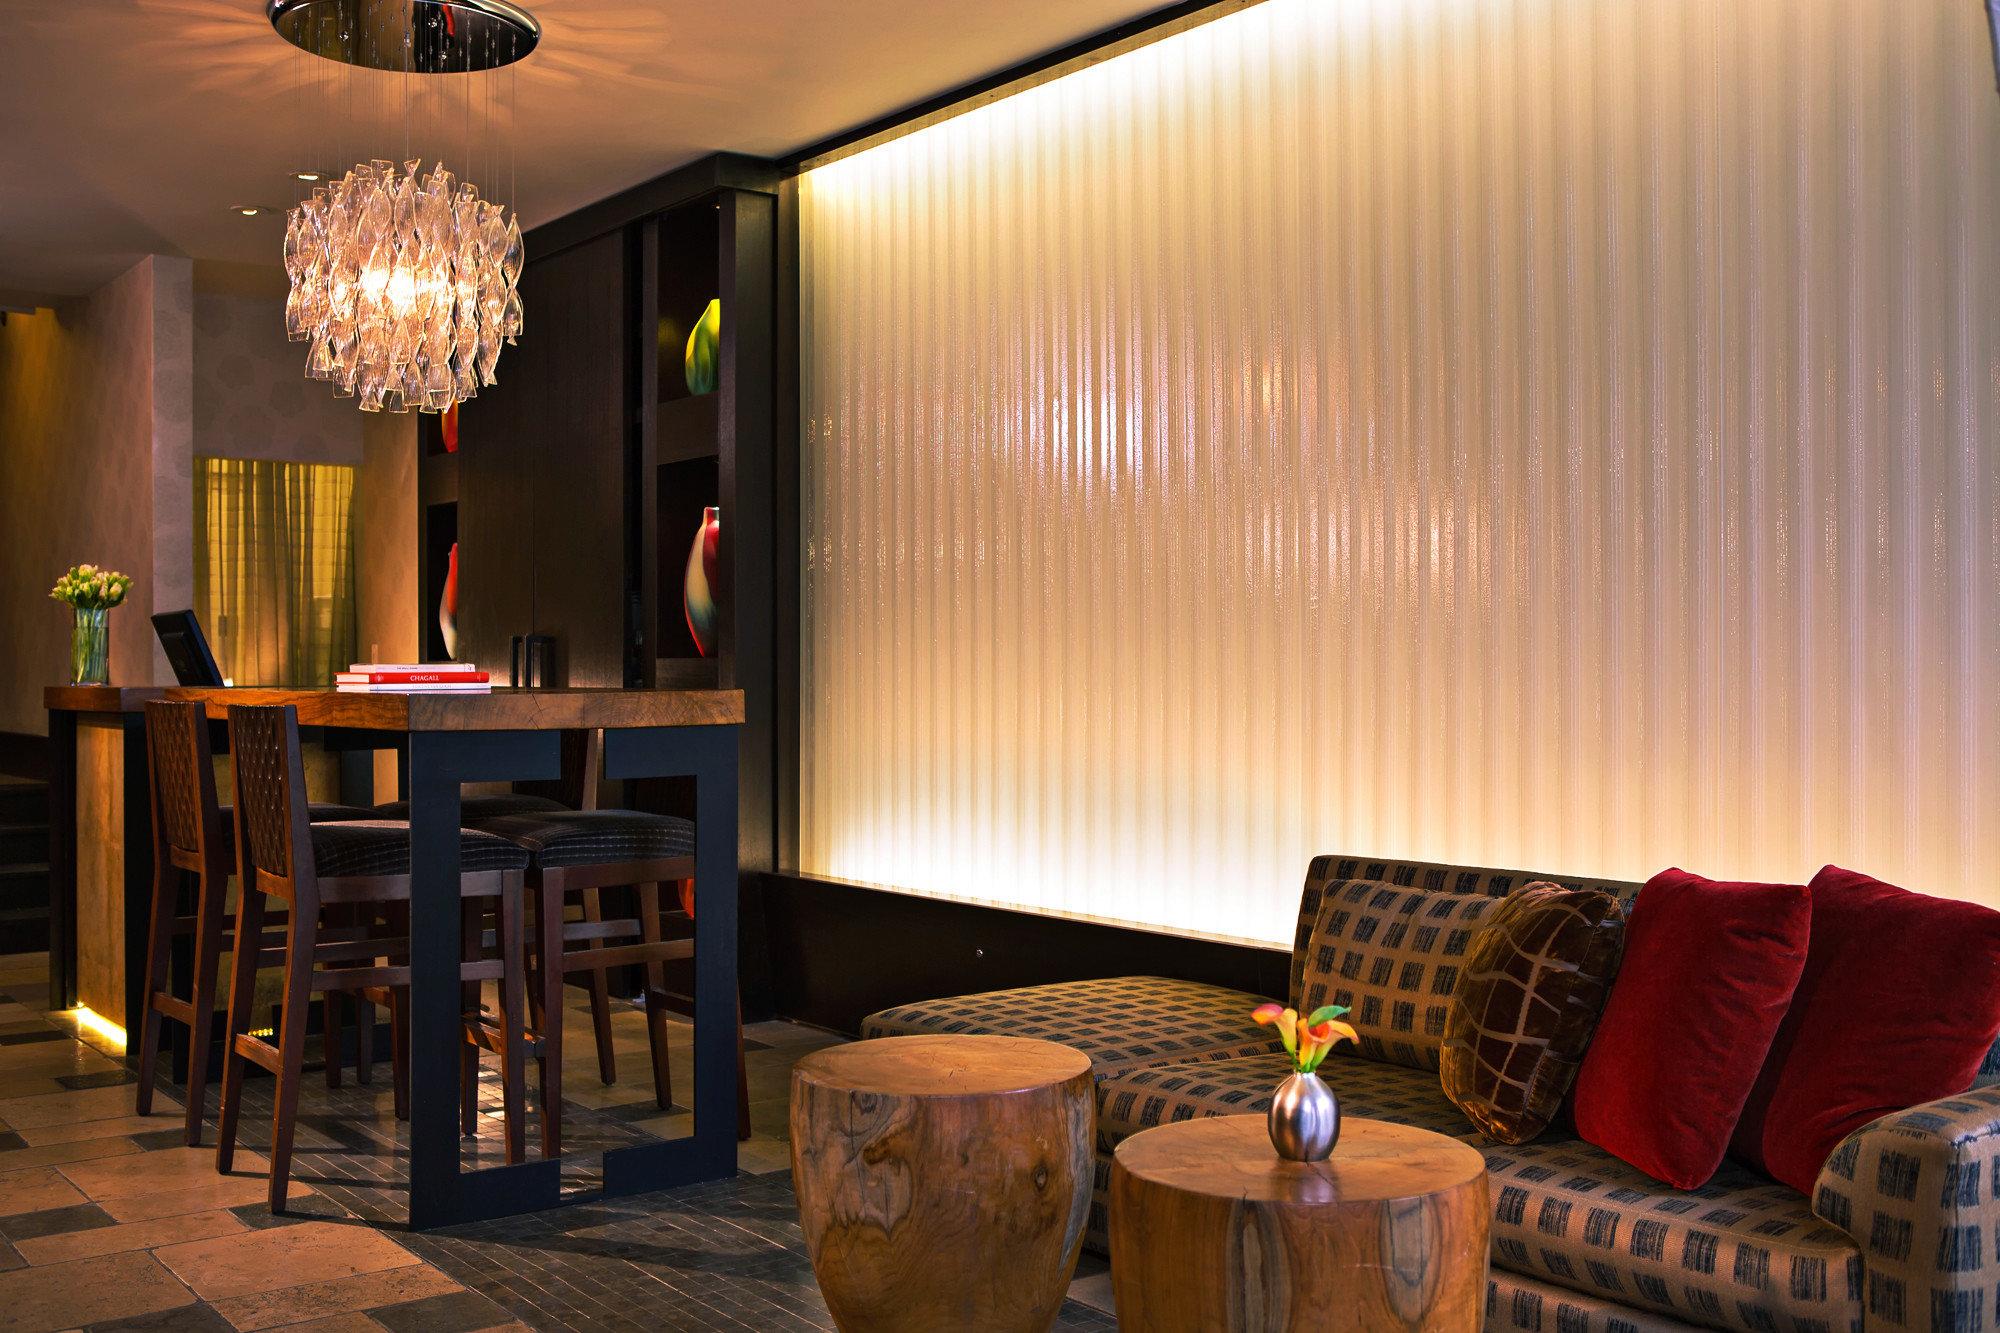 Boutique Boutique Hotels Business City Hip Hotels Lobby Lounge lighting restaurant Suite living room